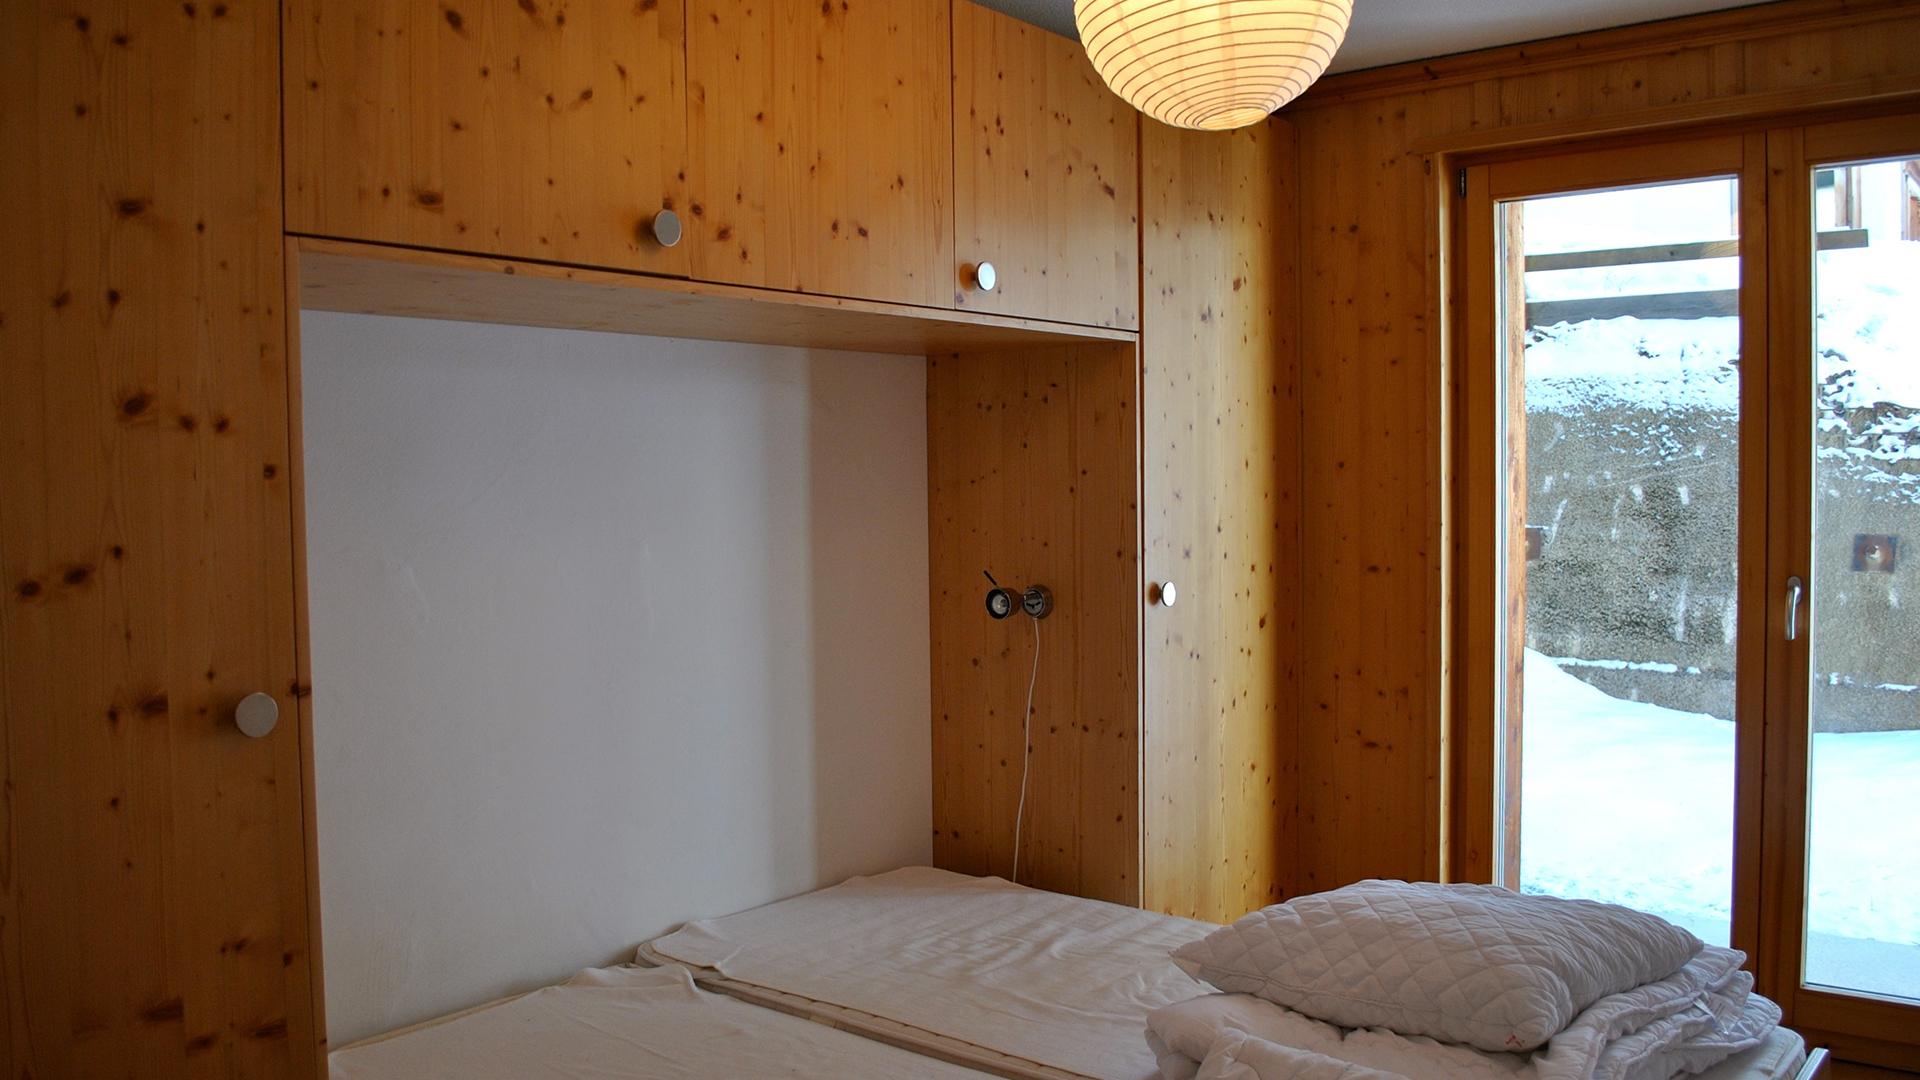 Appartement du Rhone II Apartments, Switzerland